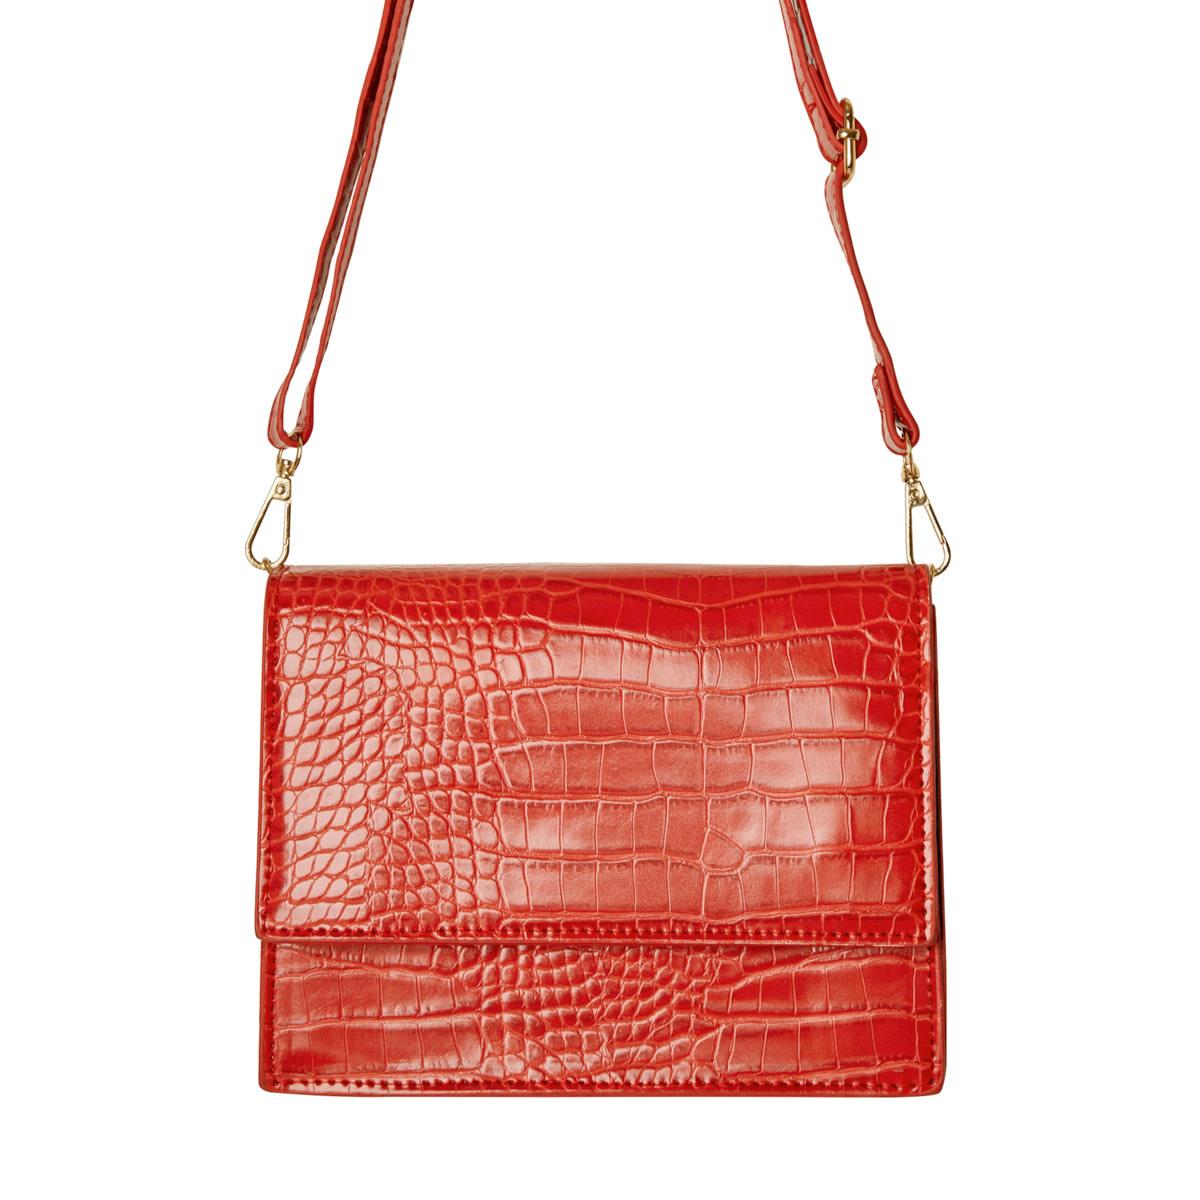 With love Bag Vogue - Red 21cm x 13.50cm x 7cm